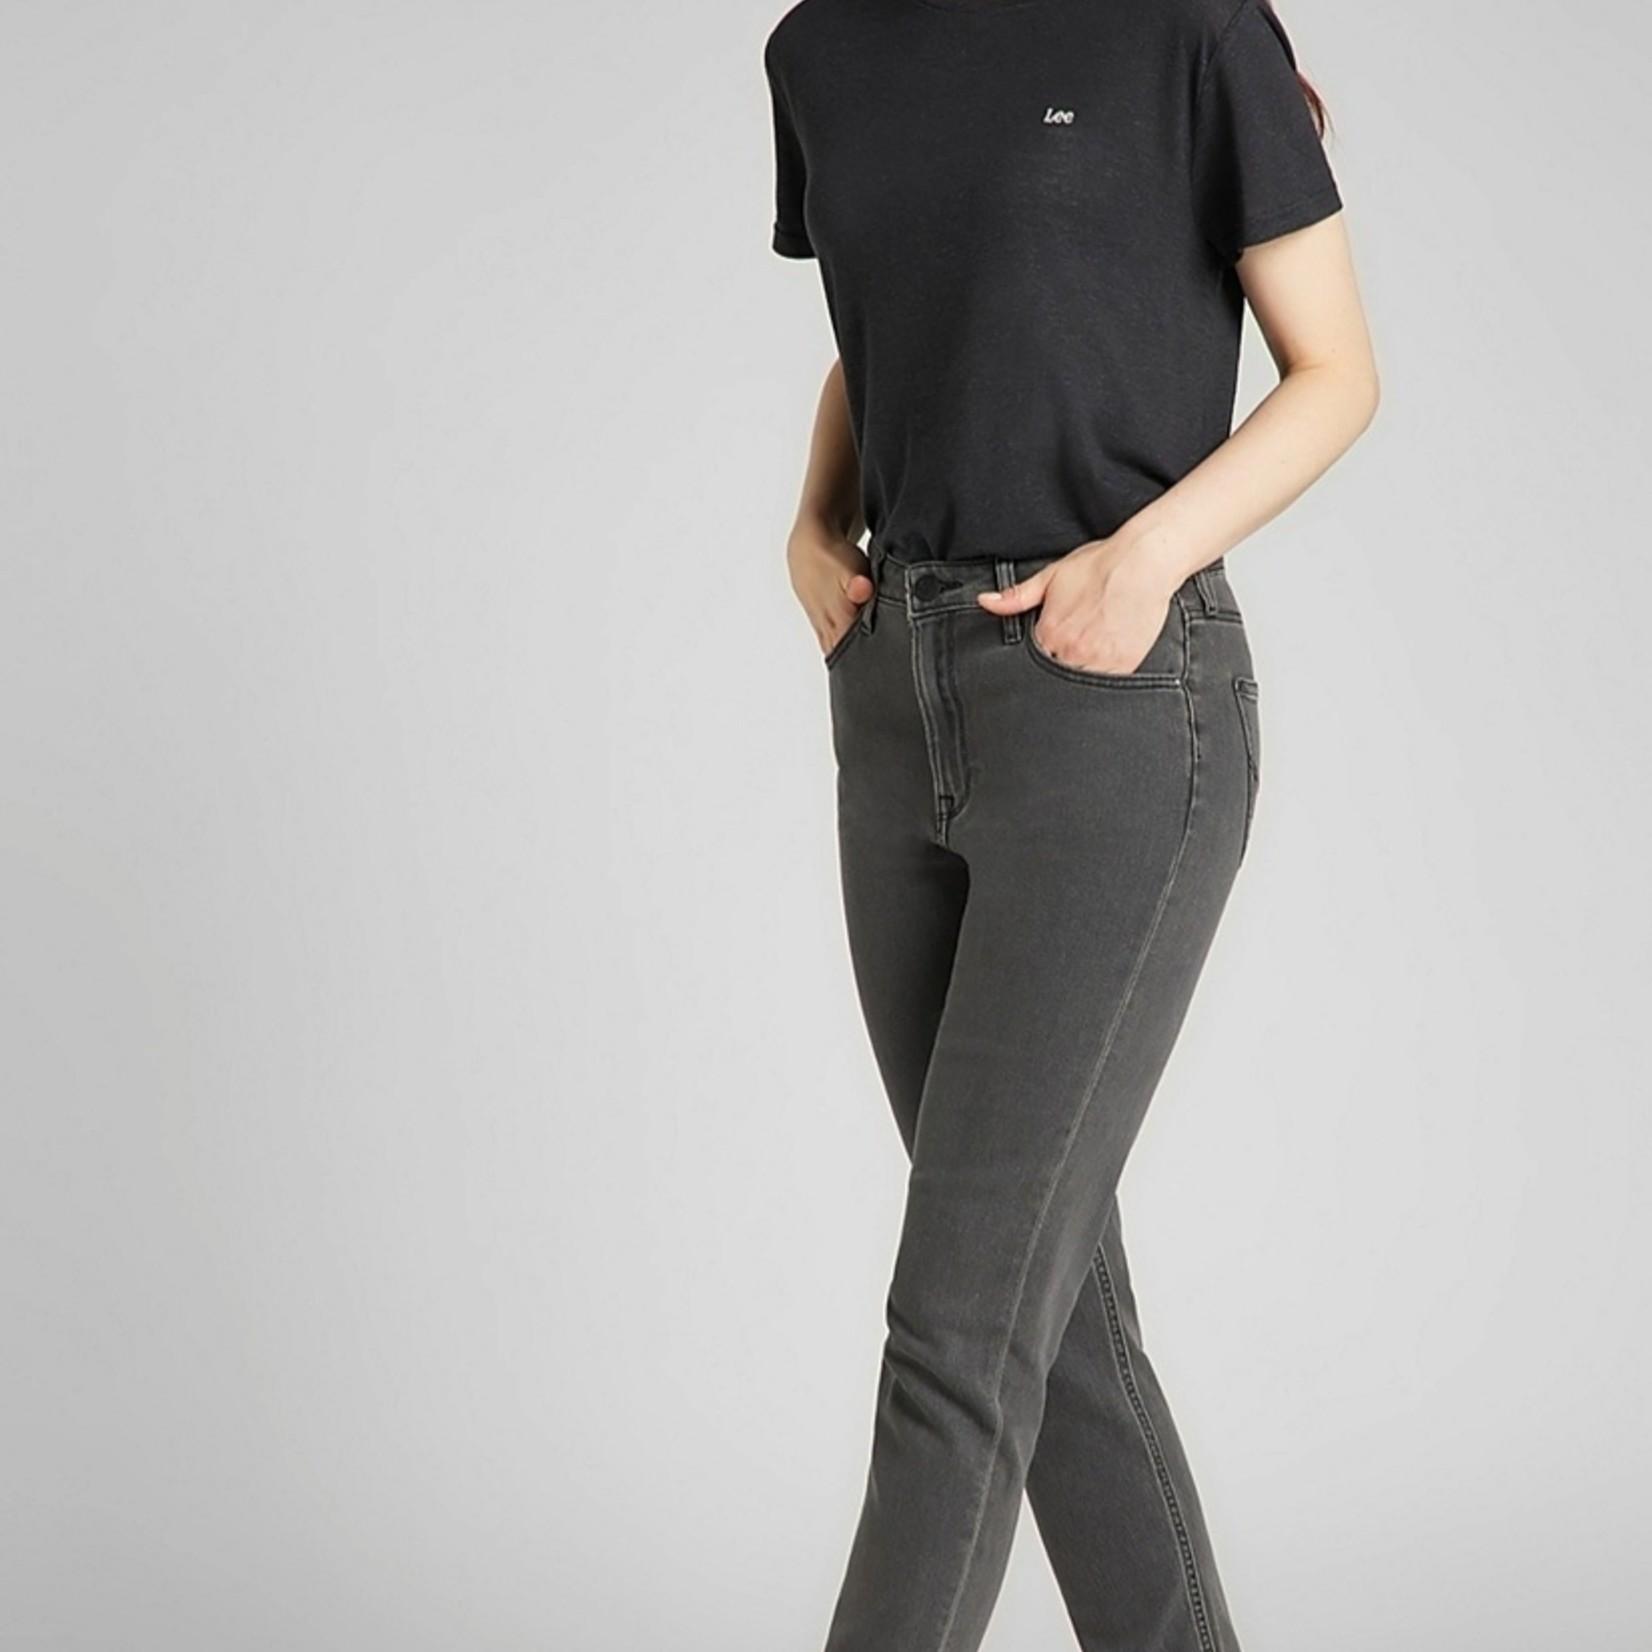 LEE CREW TEE, basic t-shirt